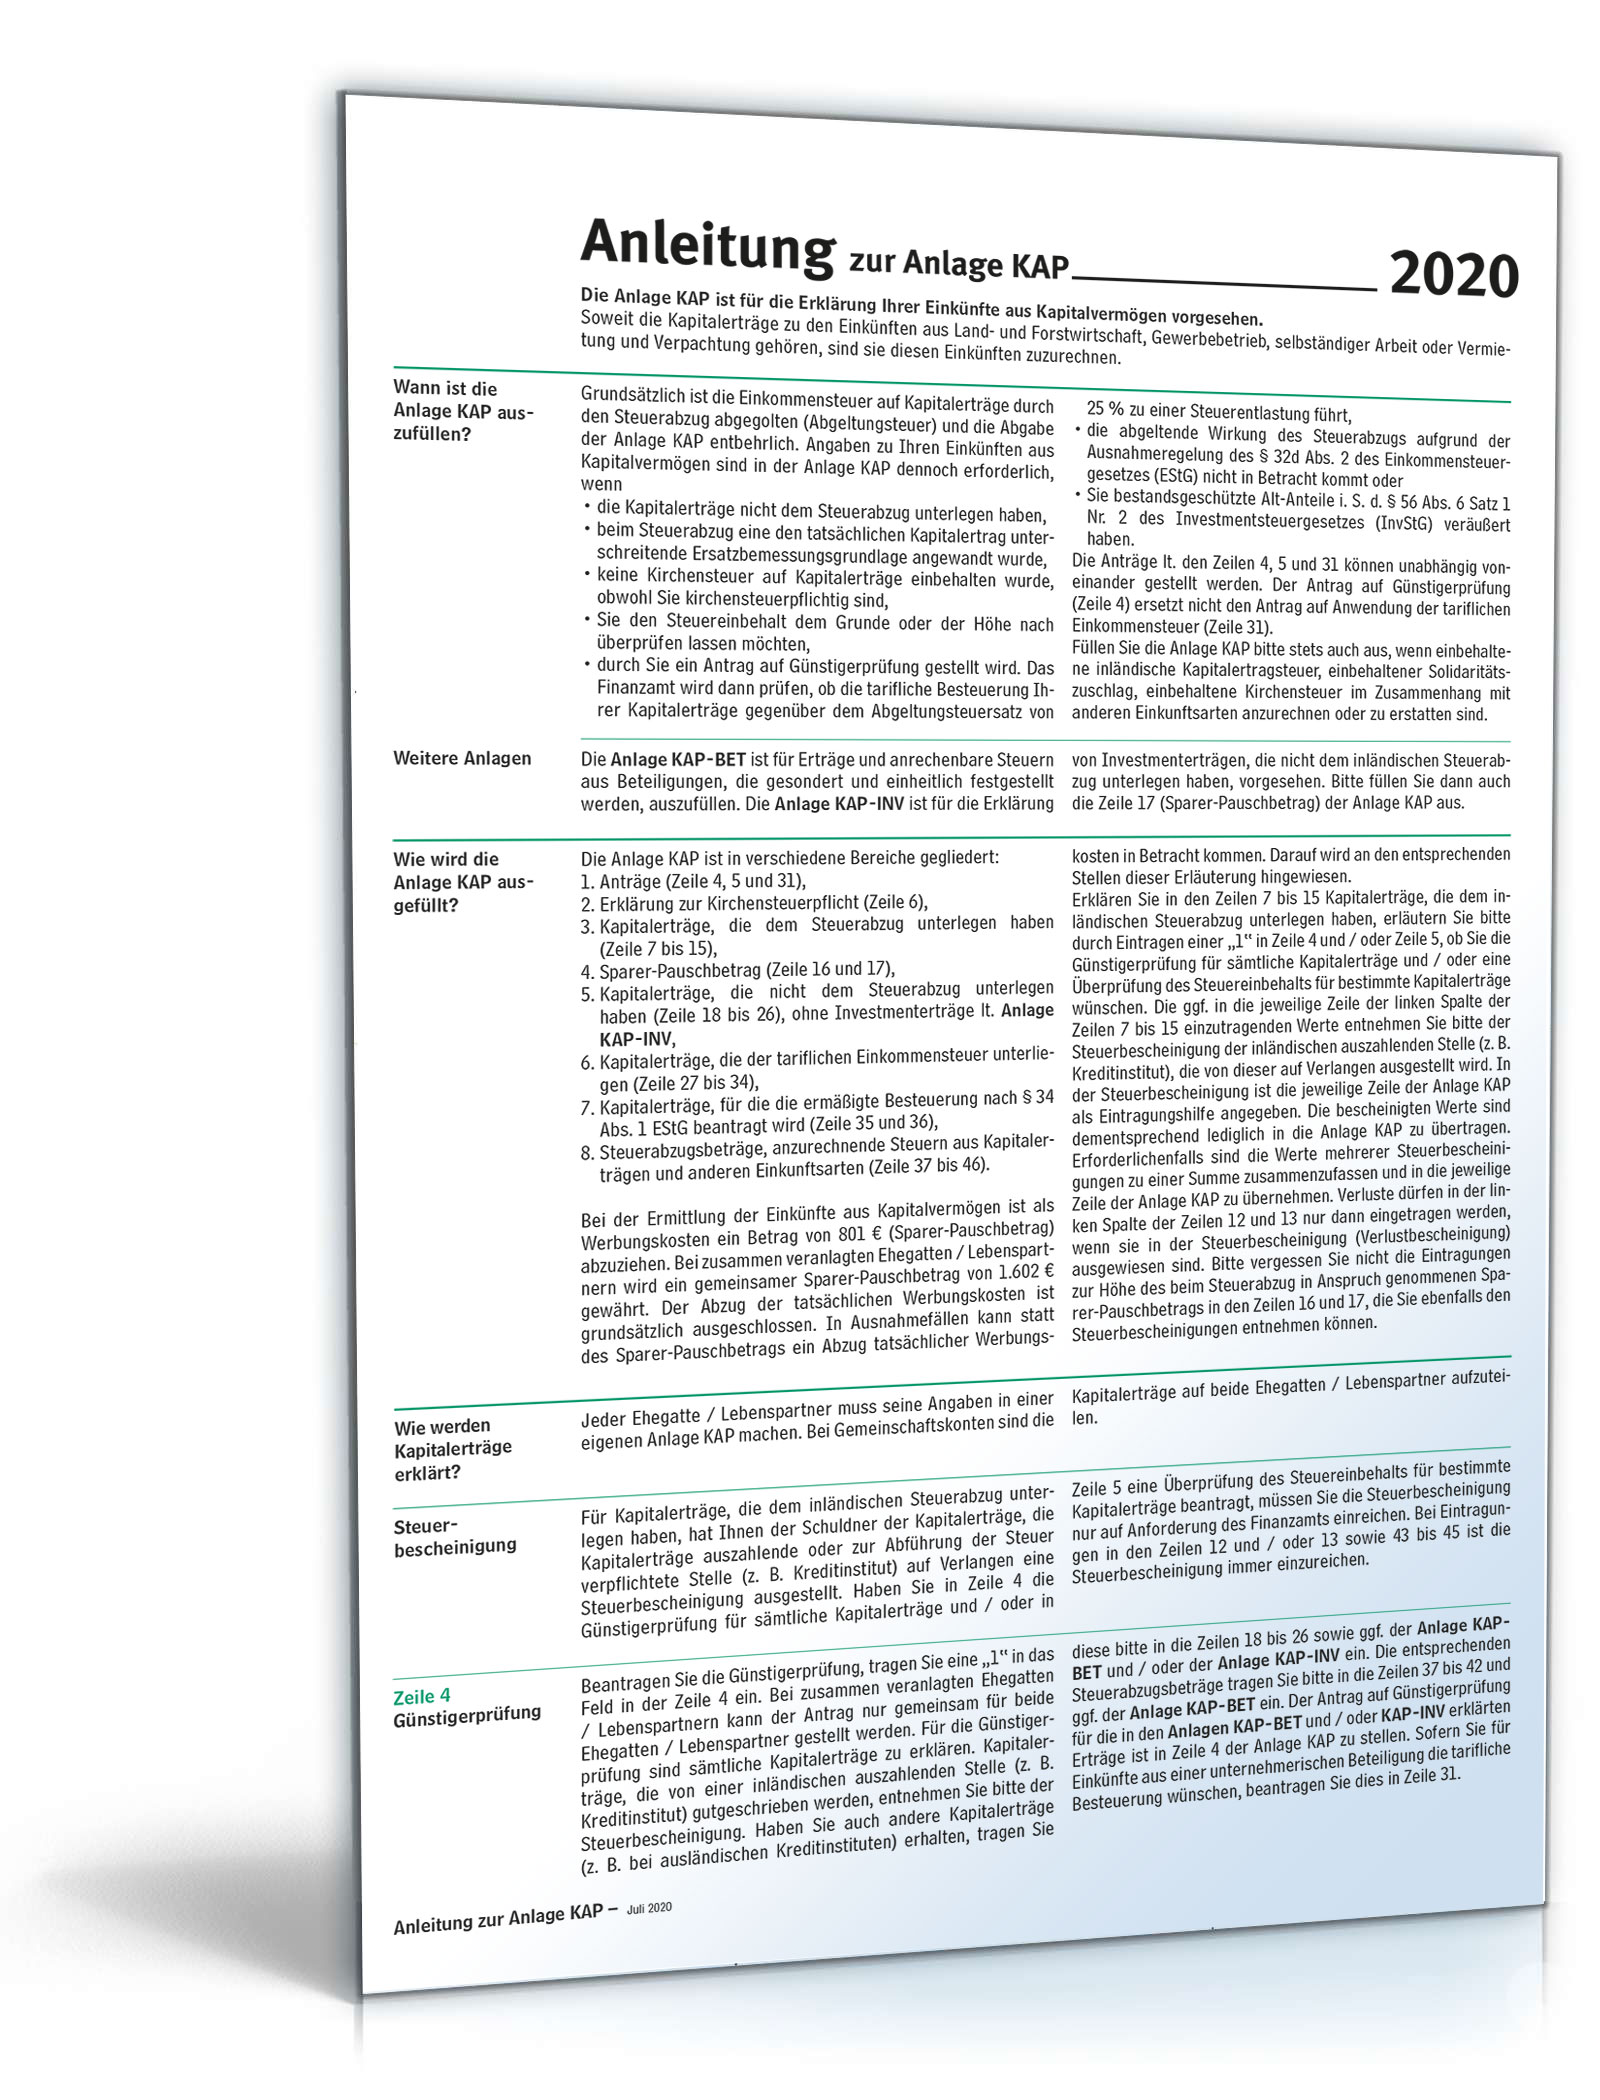 Anleitung Anlage KAP 2020 Dokument zum Download